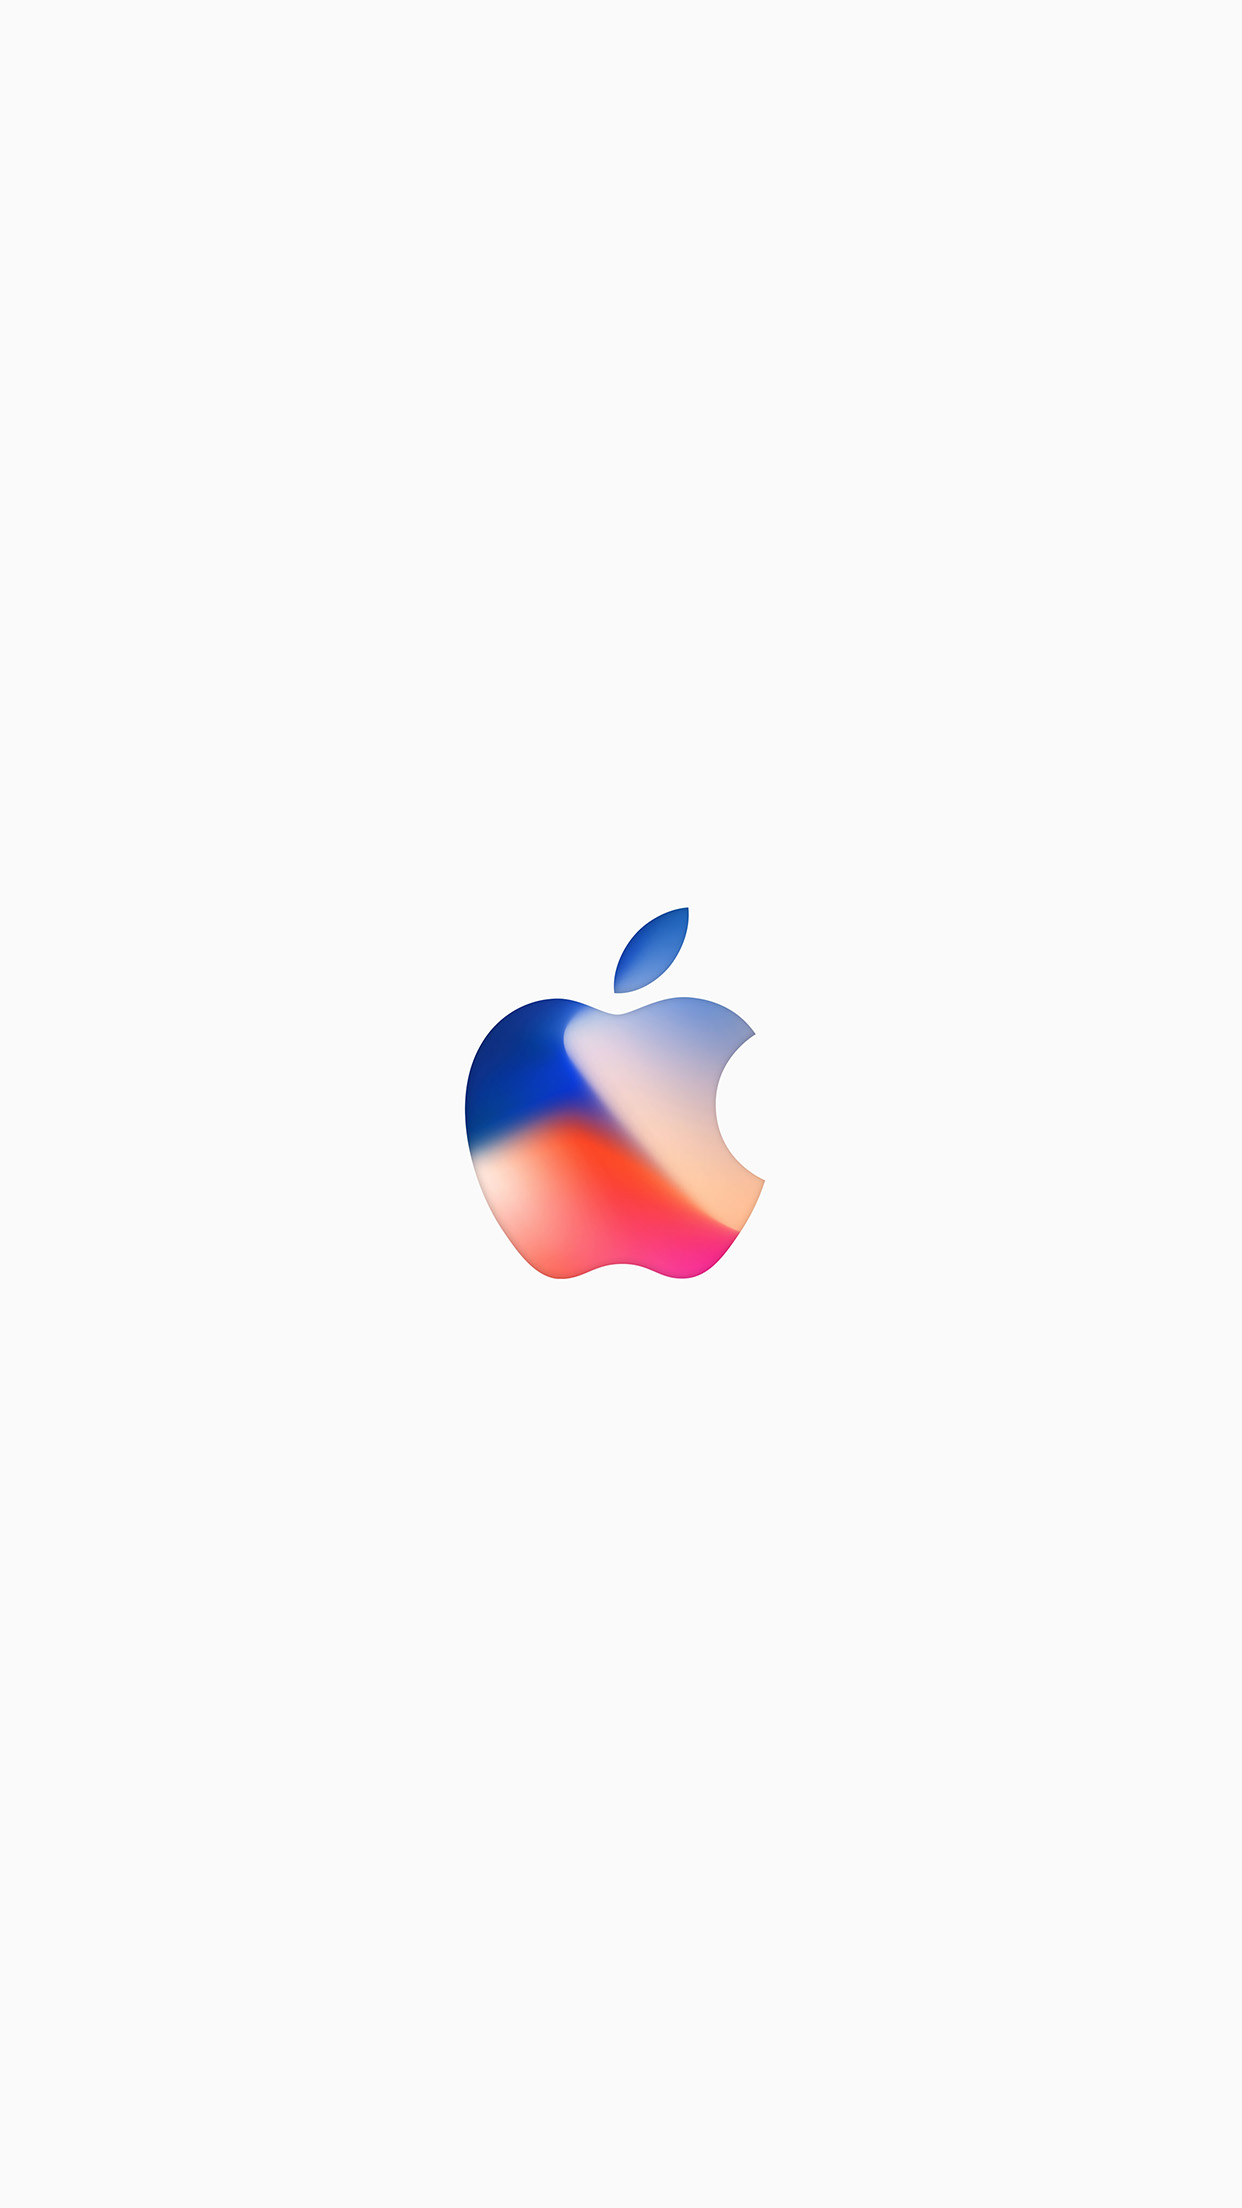 iphonepapers | iphone wallpaper | bb78-apple-iphonex-logo